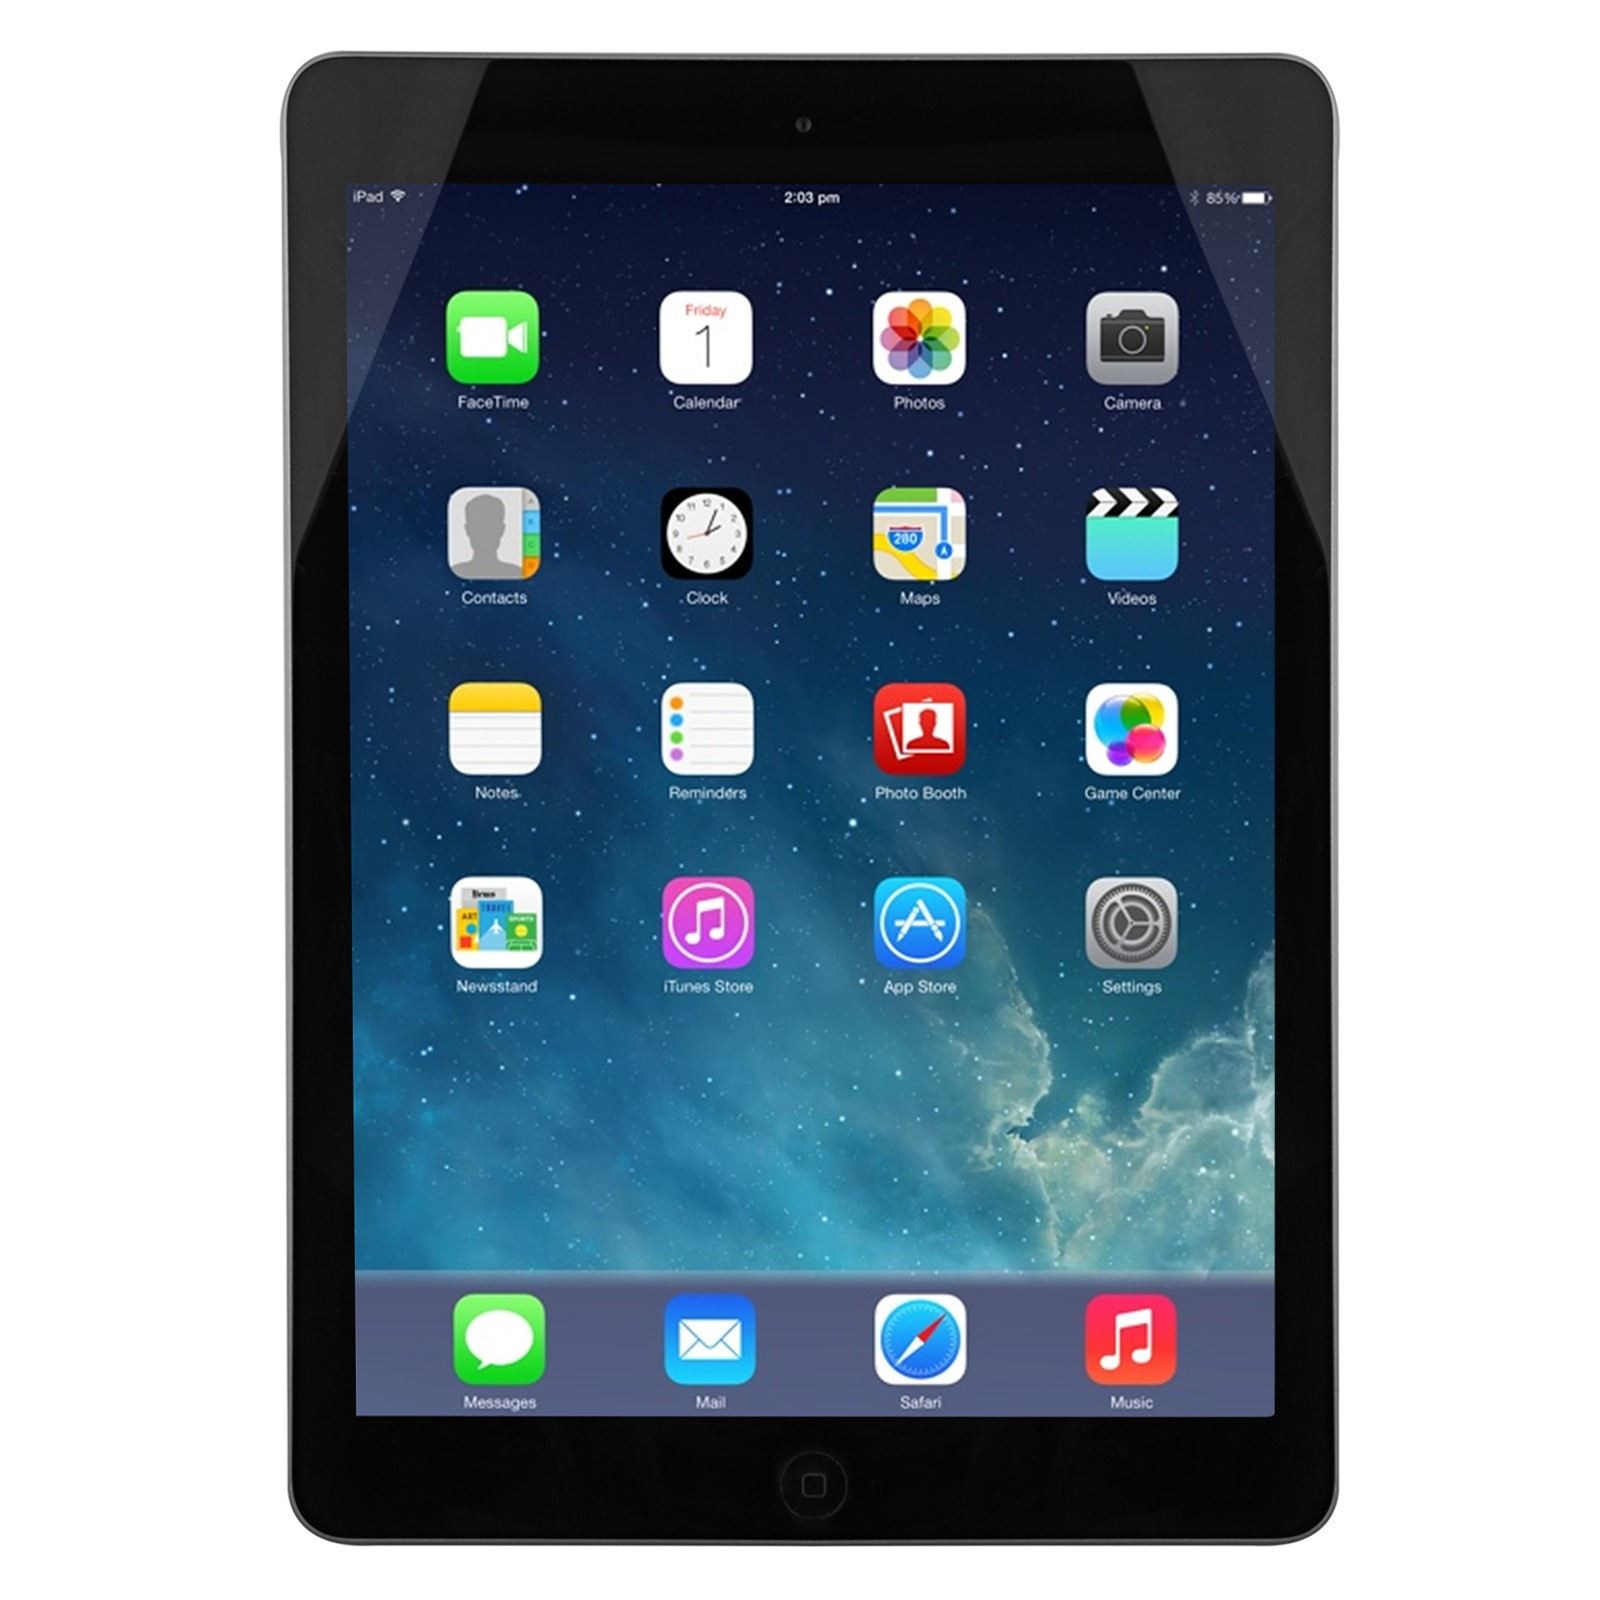 Apple iPad Air 32 GB Tablet (Gray) (Certified Refurbished)